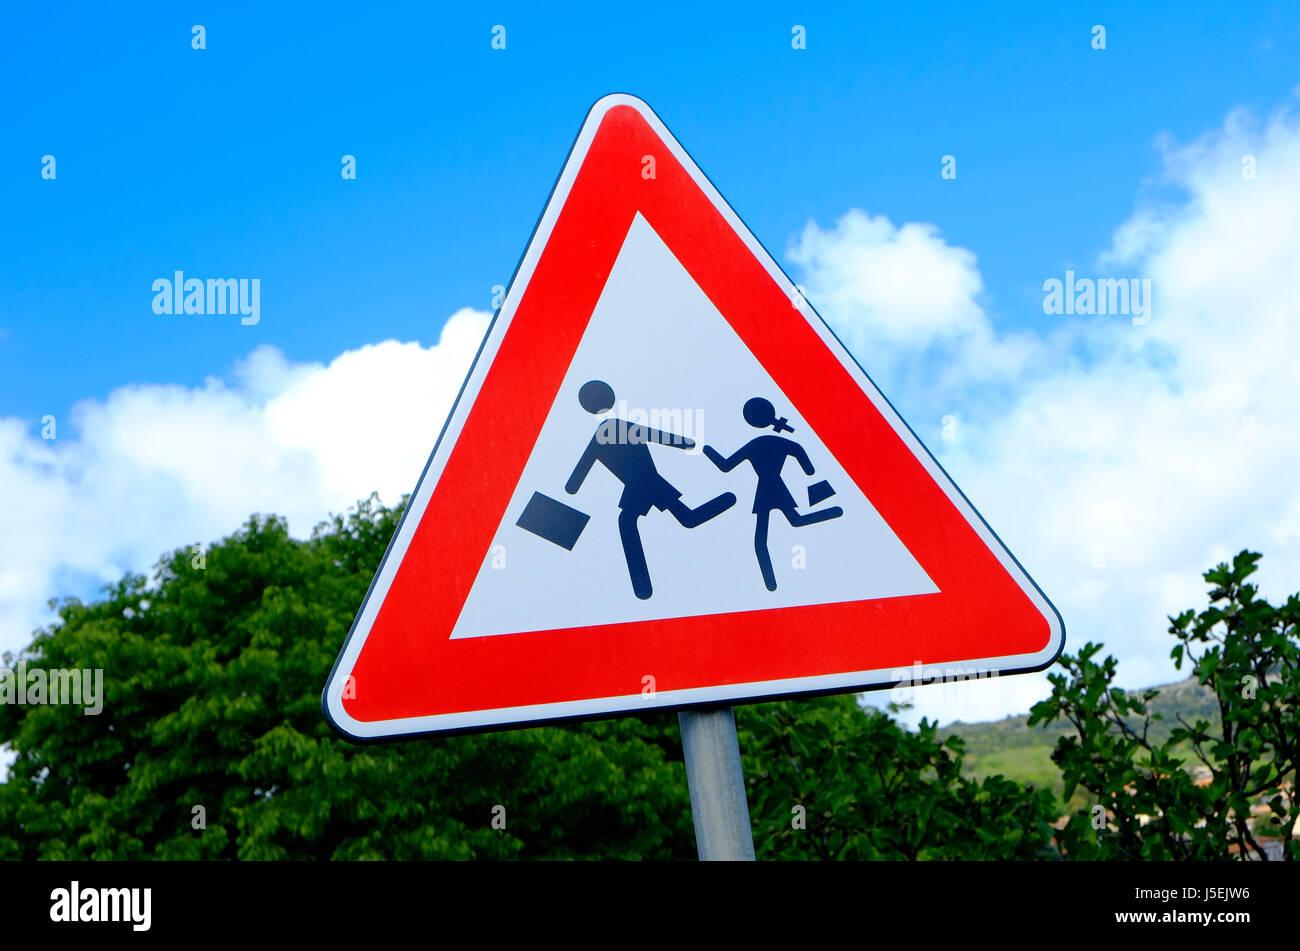 school road crossing sign, sardinia, italy - Stock Image